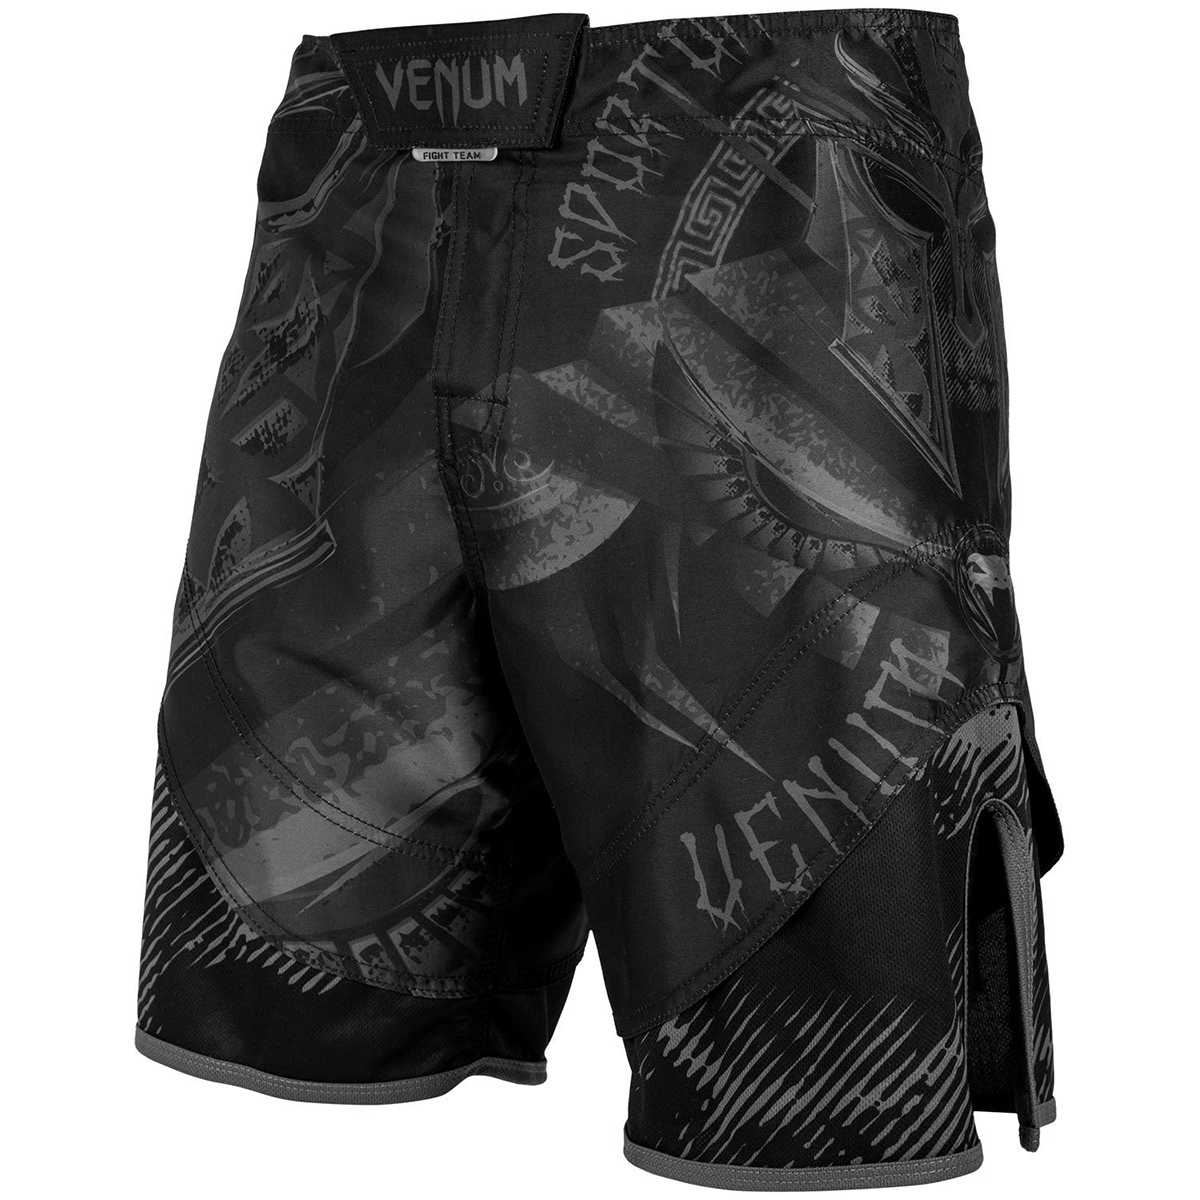 Venum Light 3.0 Mma Fight Shorts Activewear Black/white Discounts Price Boxing, Martial Arts & Mma